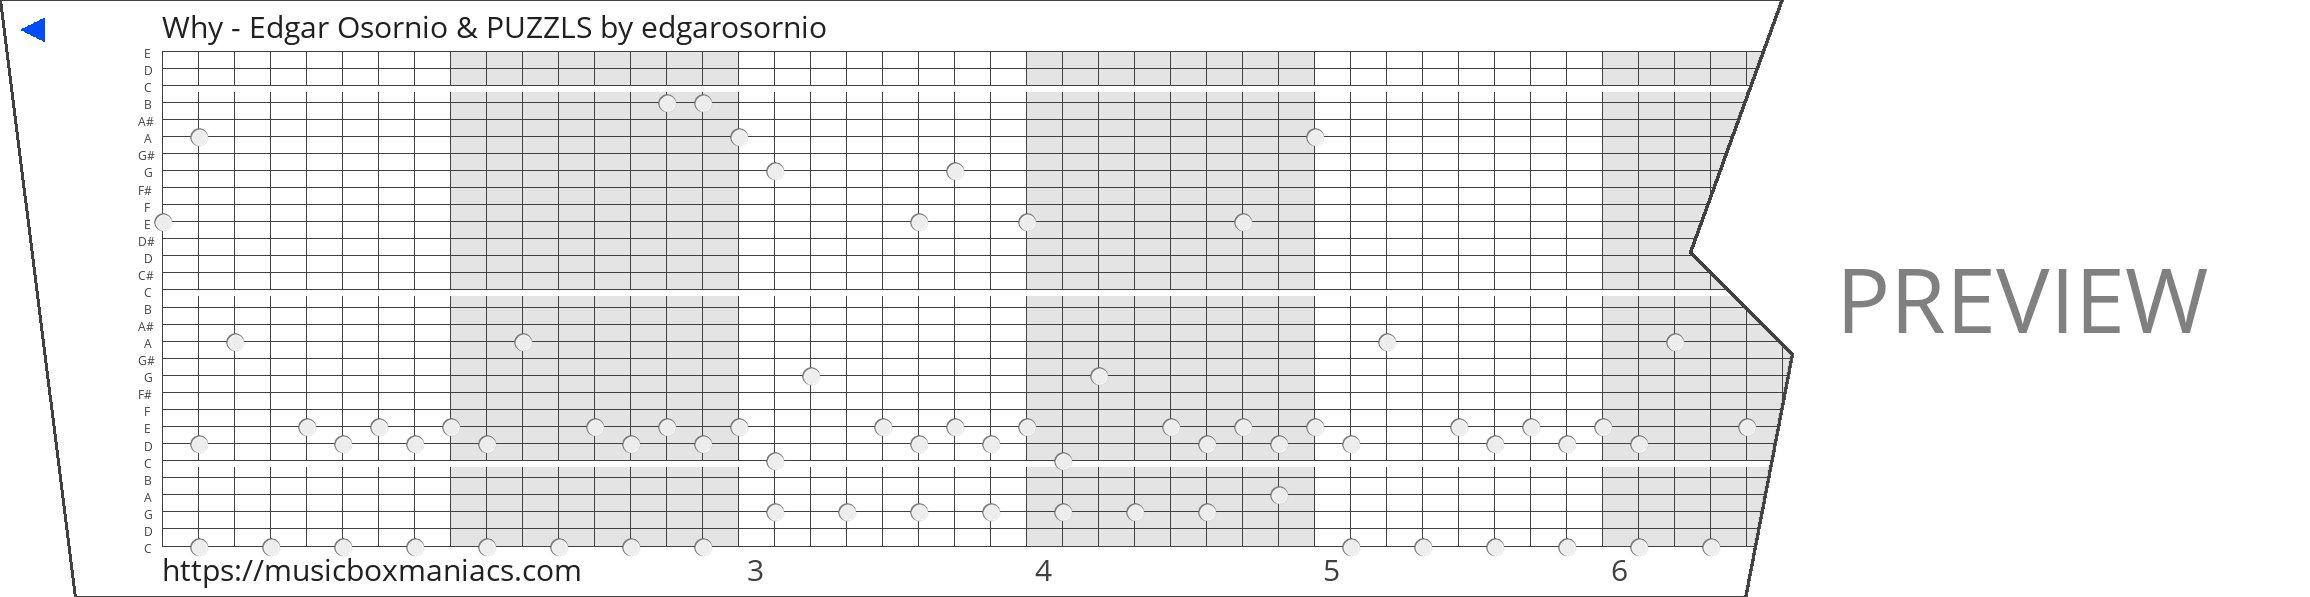 Why - Edgar Osornio & PUZZLS 30 note music box paper strip